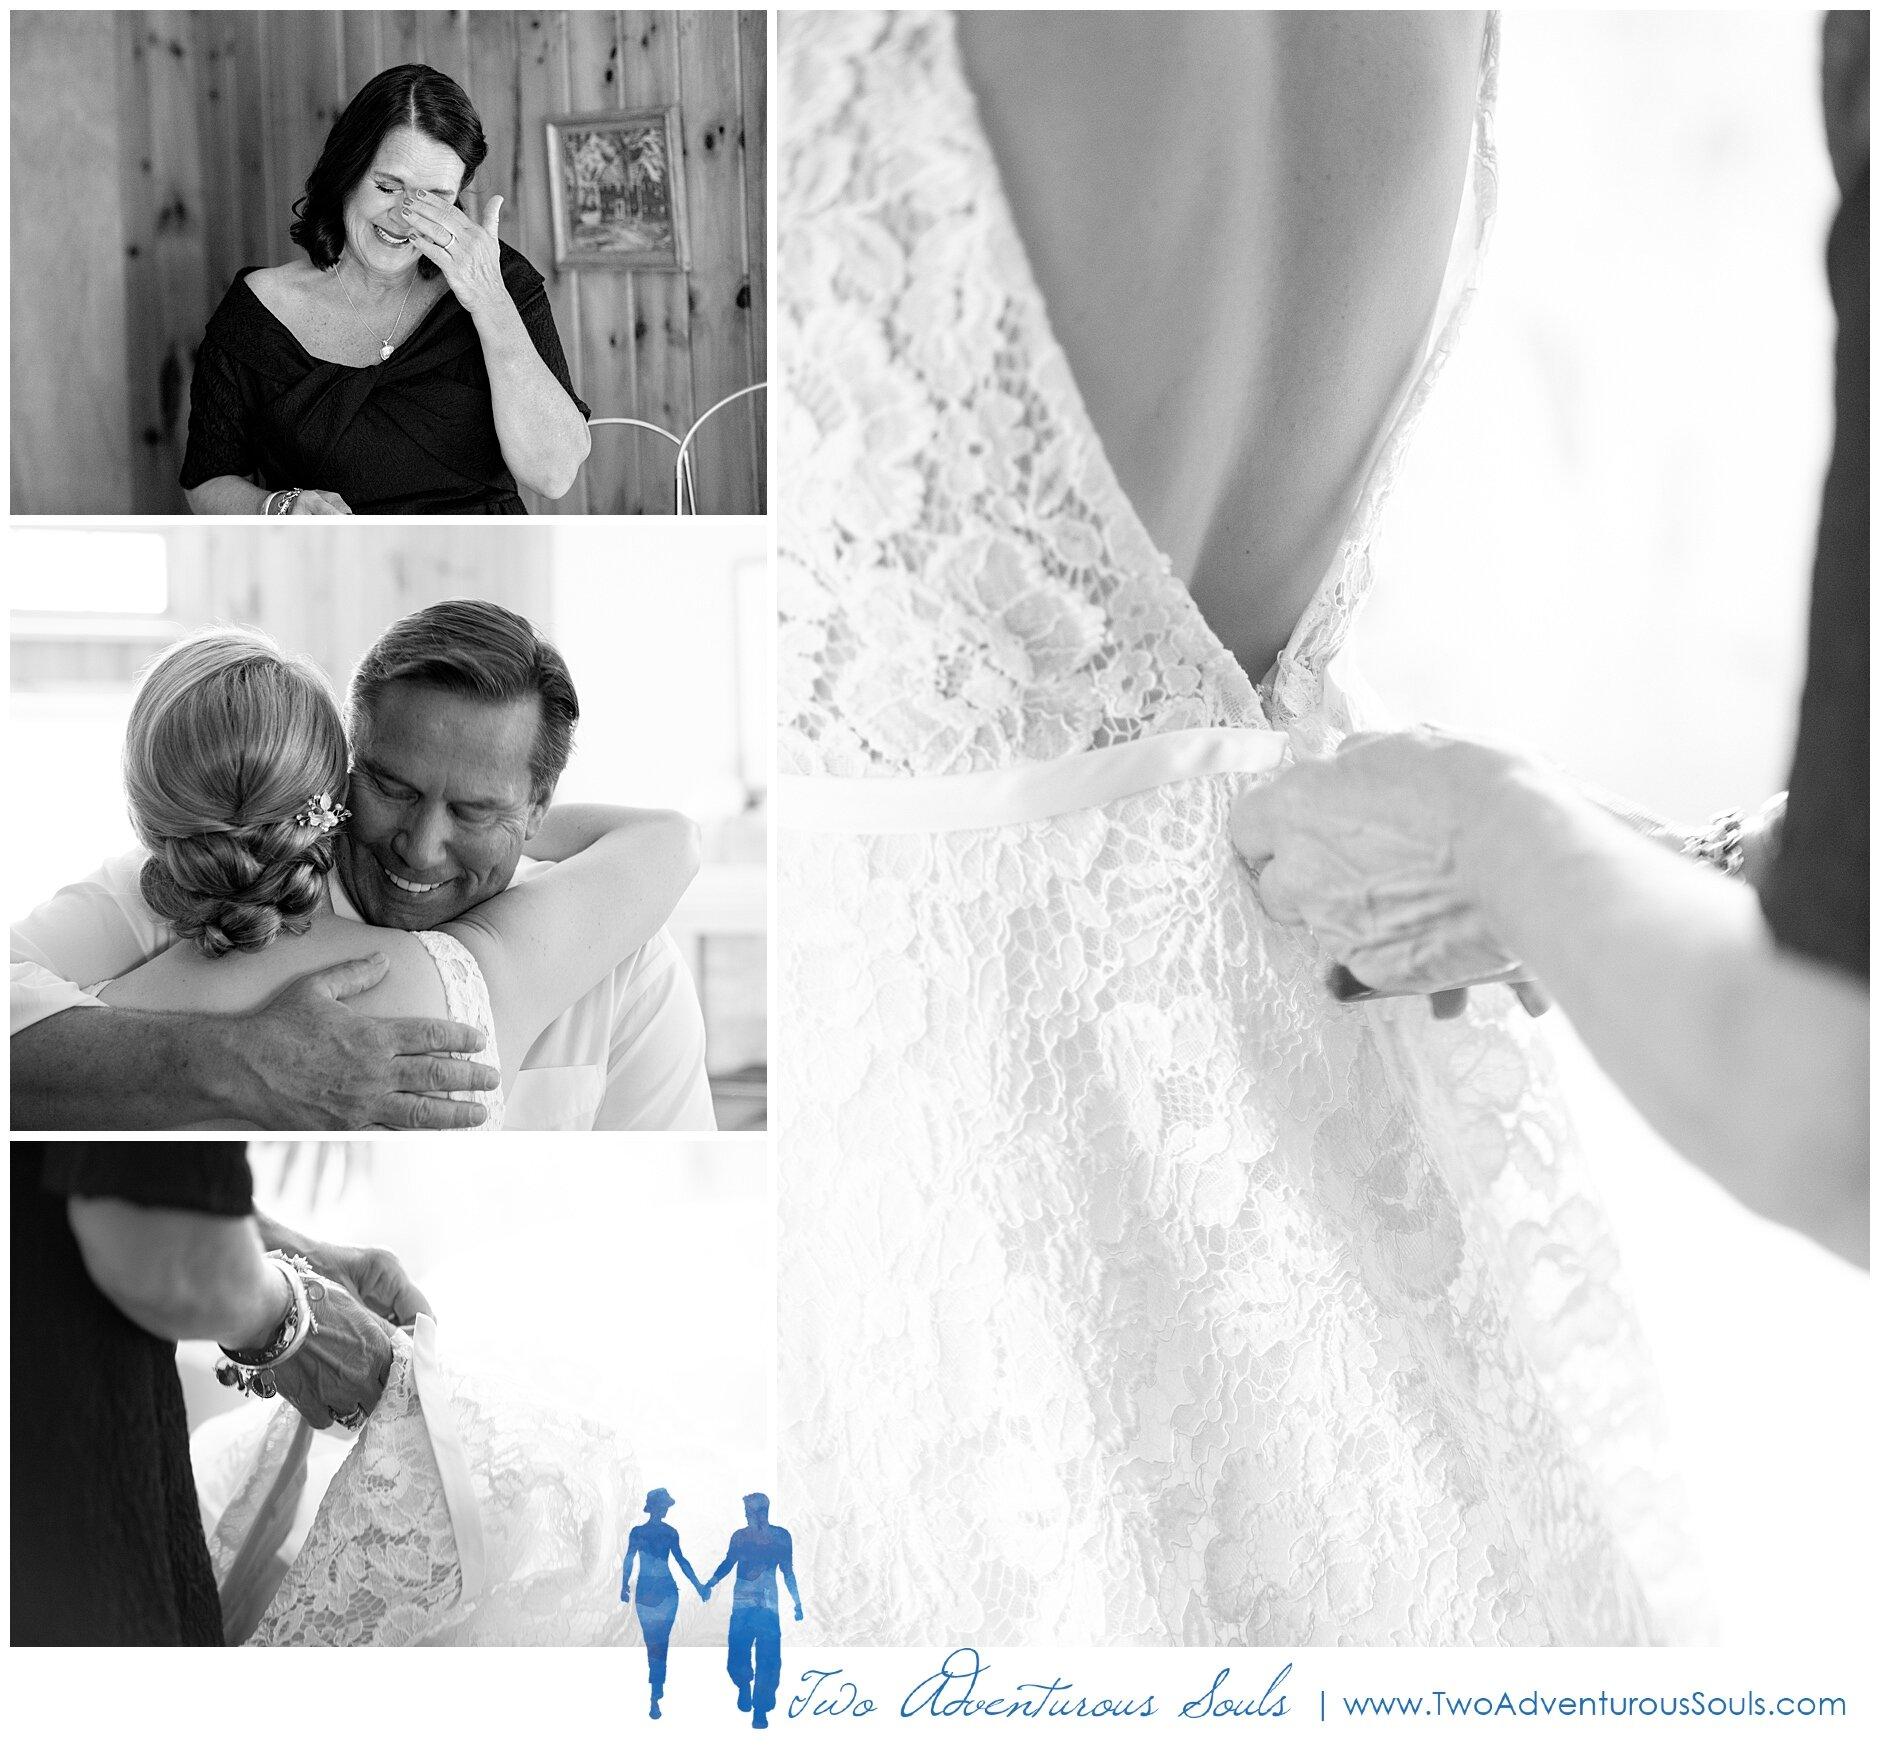 Breakwater Inn and Spa Wedding Photographers, Kennebunkport Wedding Photographers, Two Adventurous Souls- 092119_0012.jpg